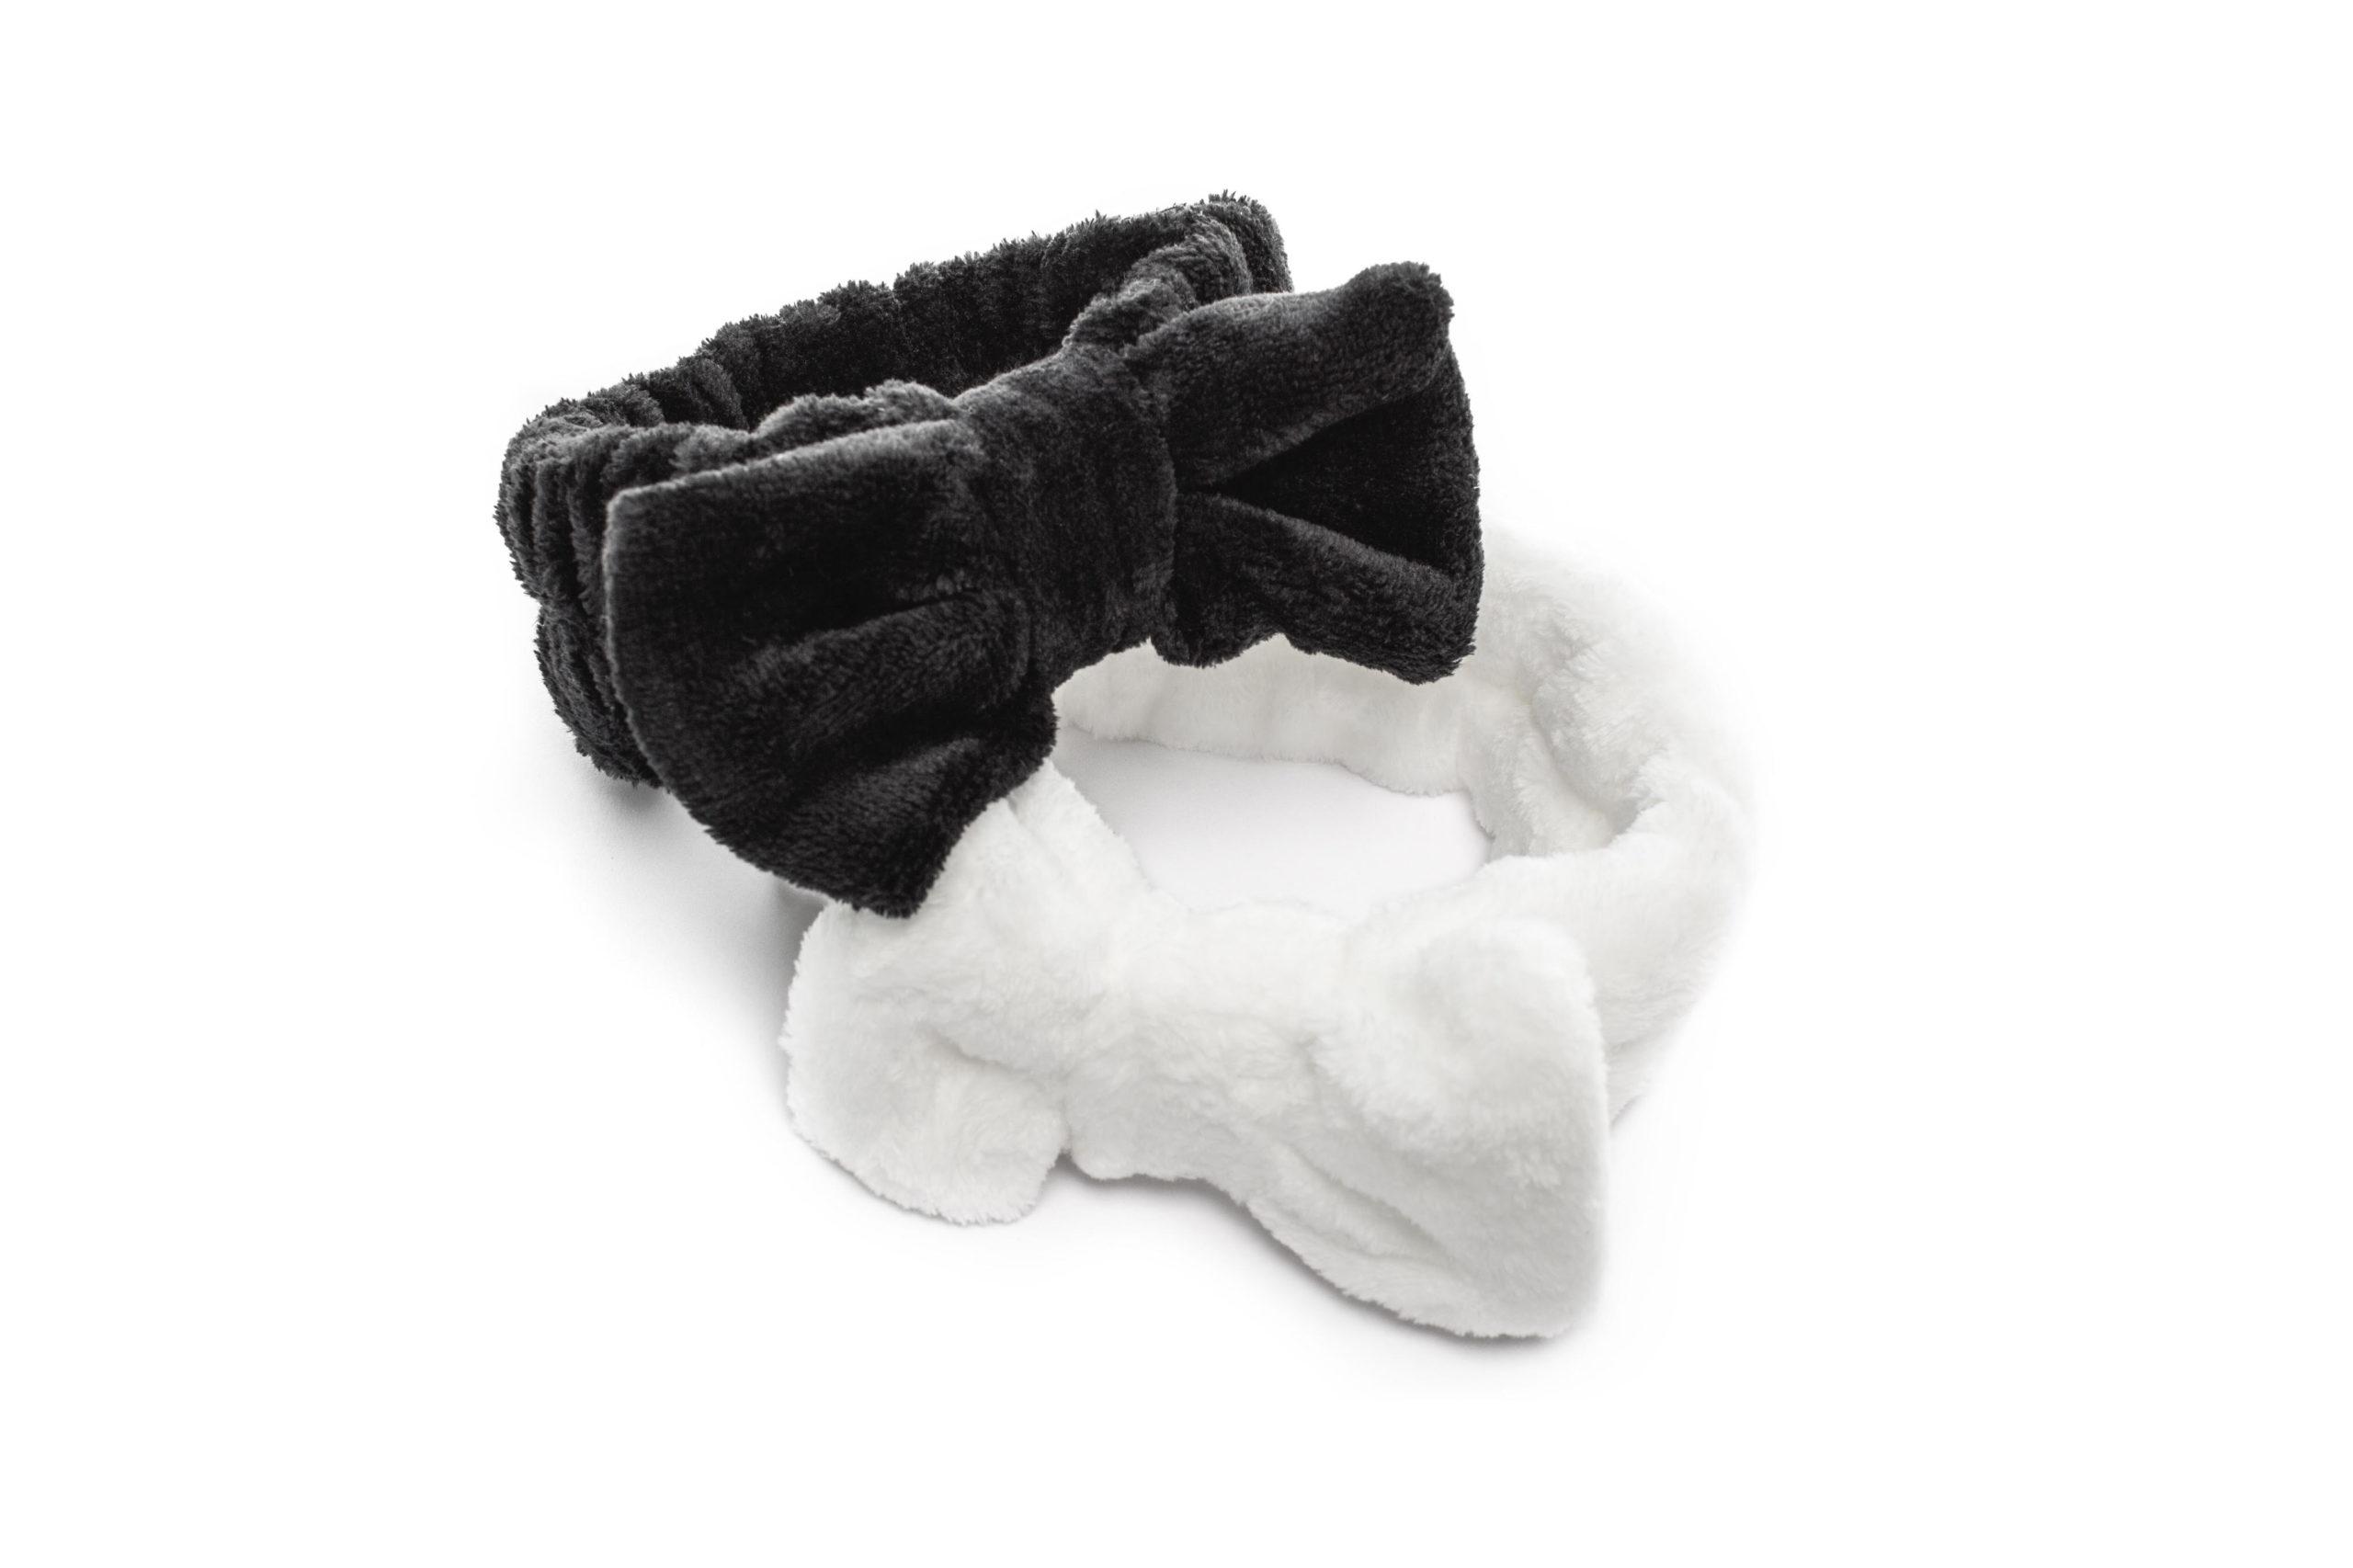 Diadema maquillaje lazo blanco y negro